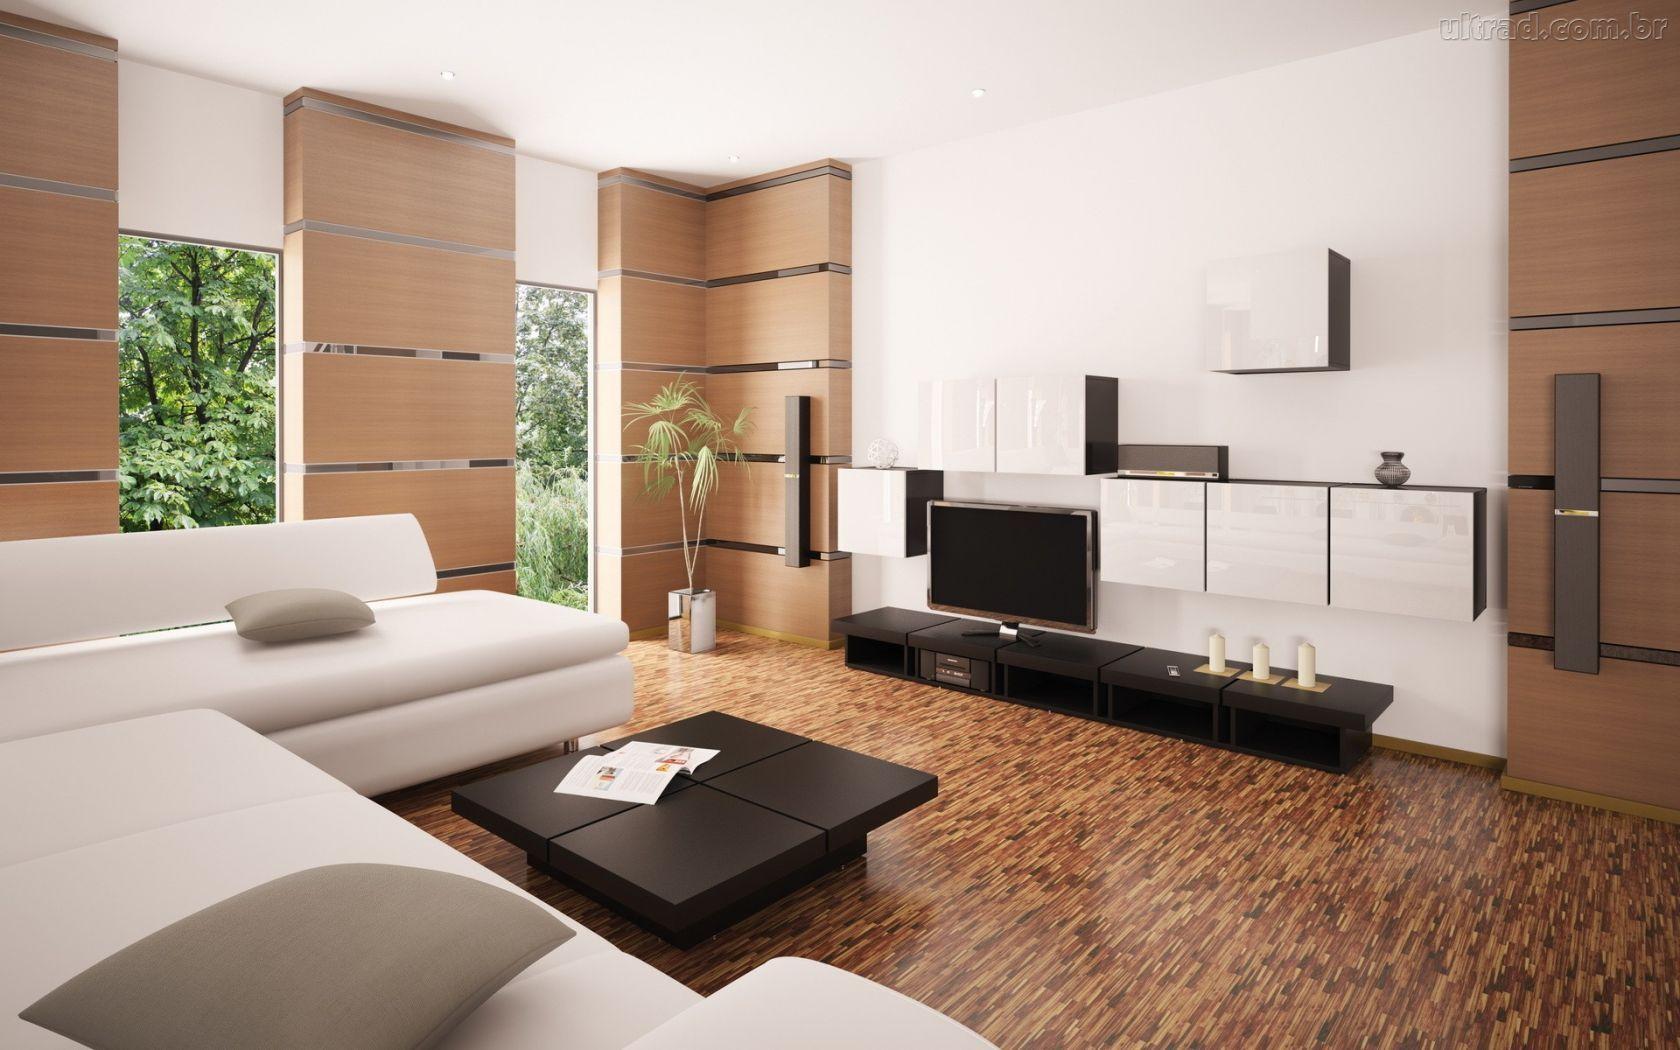 Sala De Estar Arquitectura ~ Sala de Estar  Arquitectura Interior  Pinterest  Ladrillos